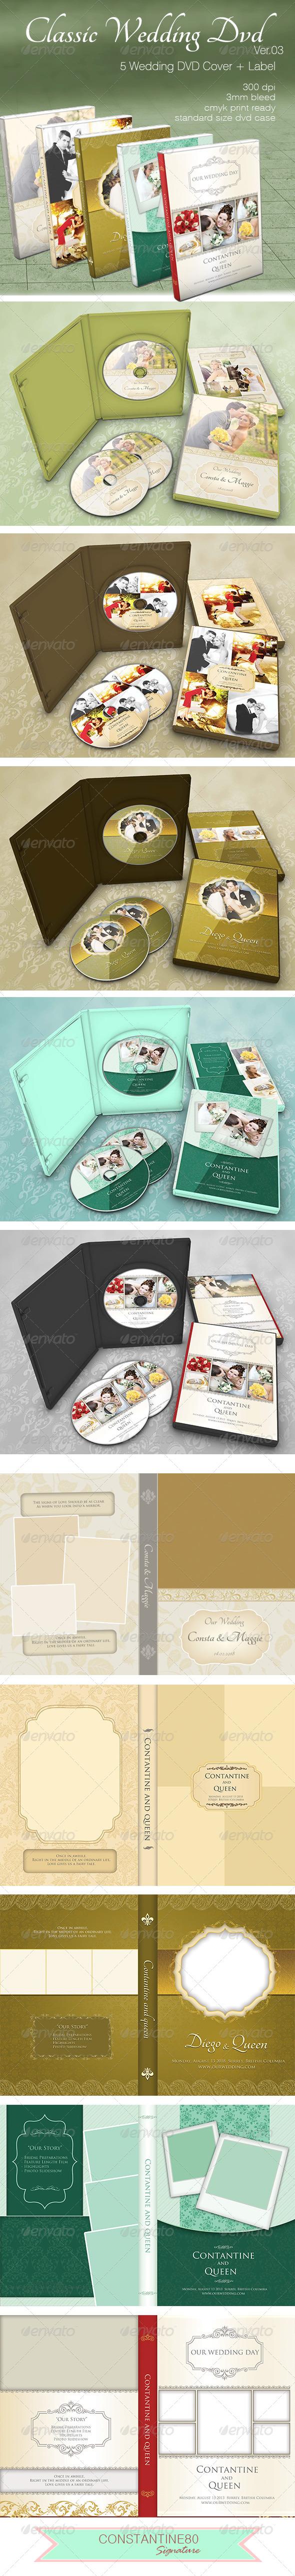 Classic Wedding Dvd ver03 - CD & DVD Artwork Print Templates